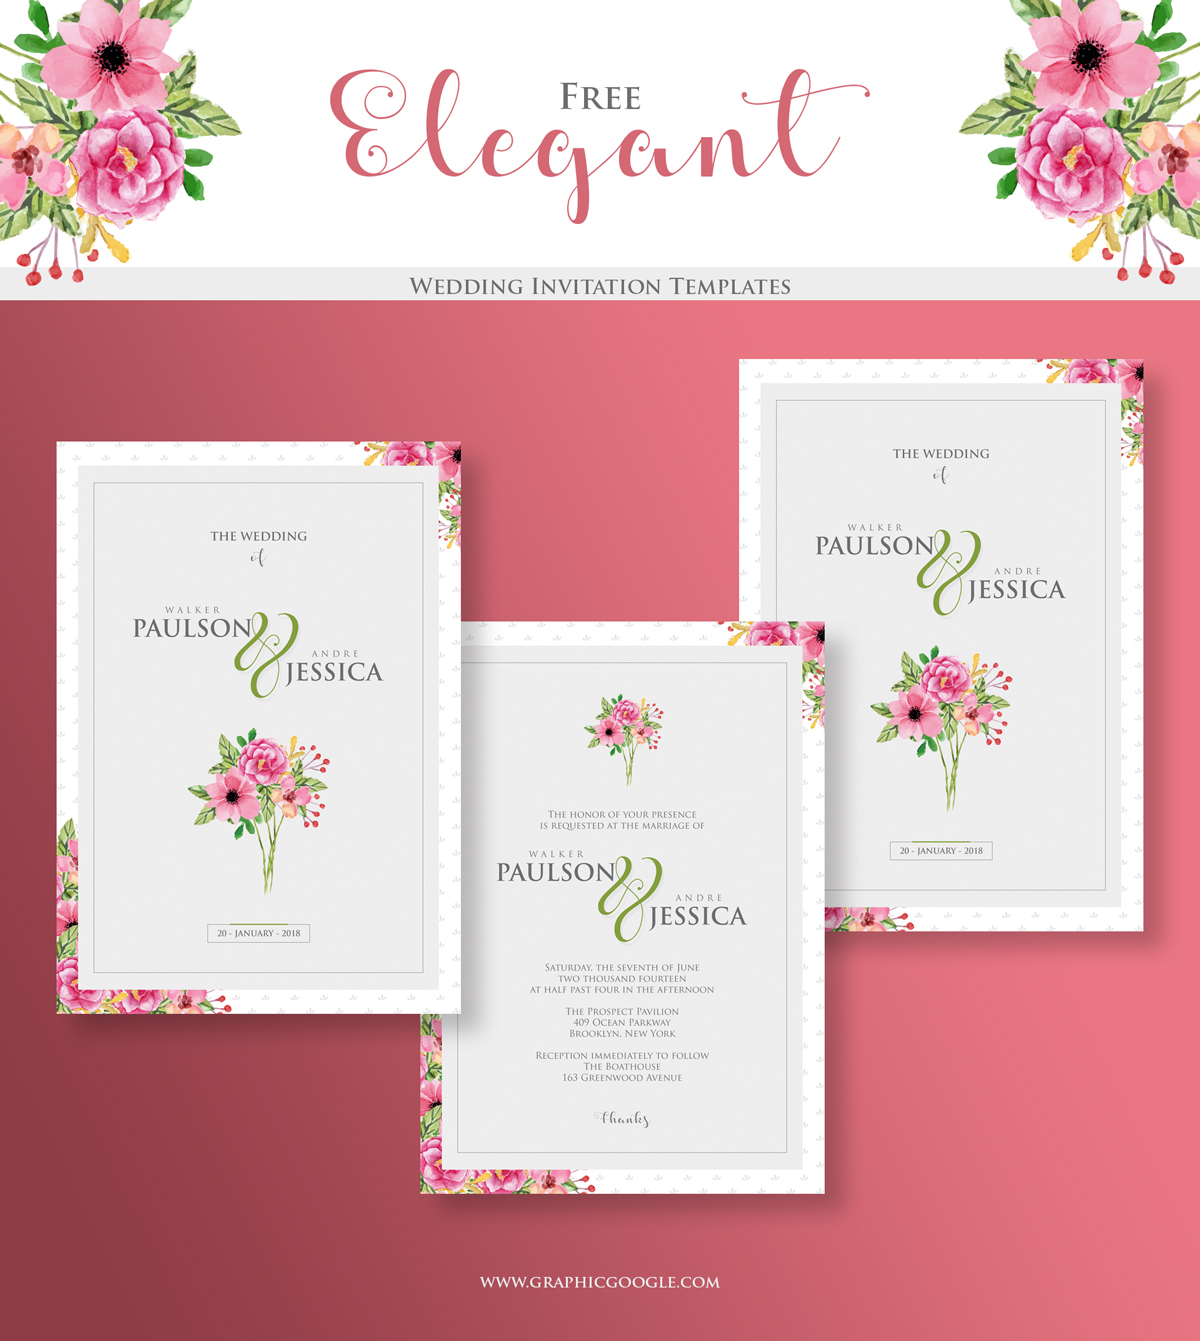 Free Wedding Invitation Downloads: Elegant Wedding Free Invitation Templates